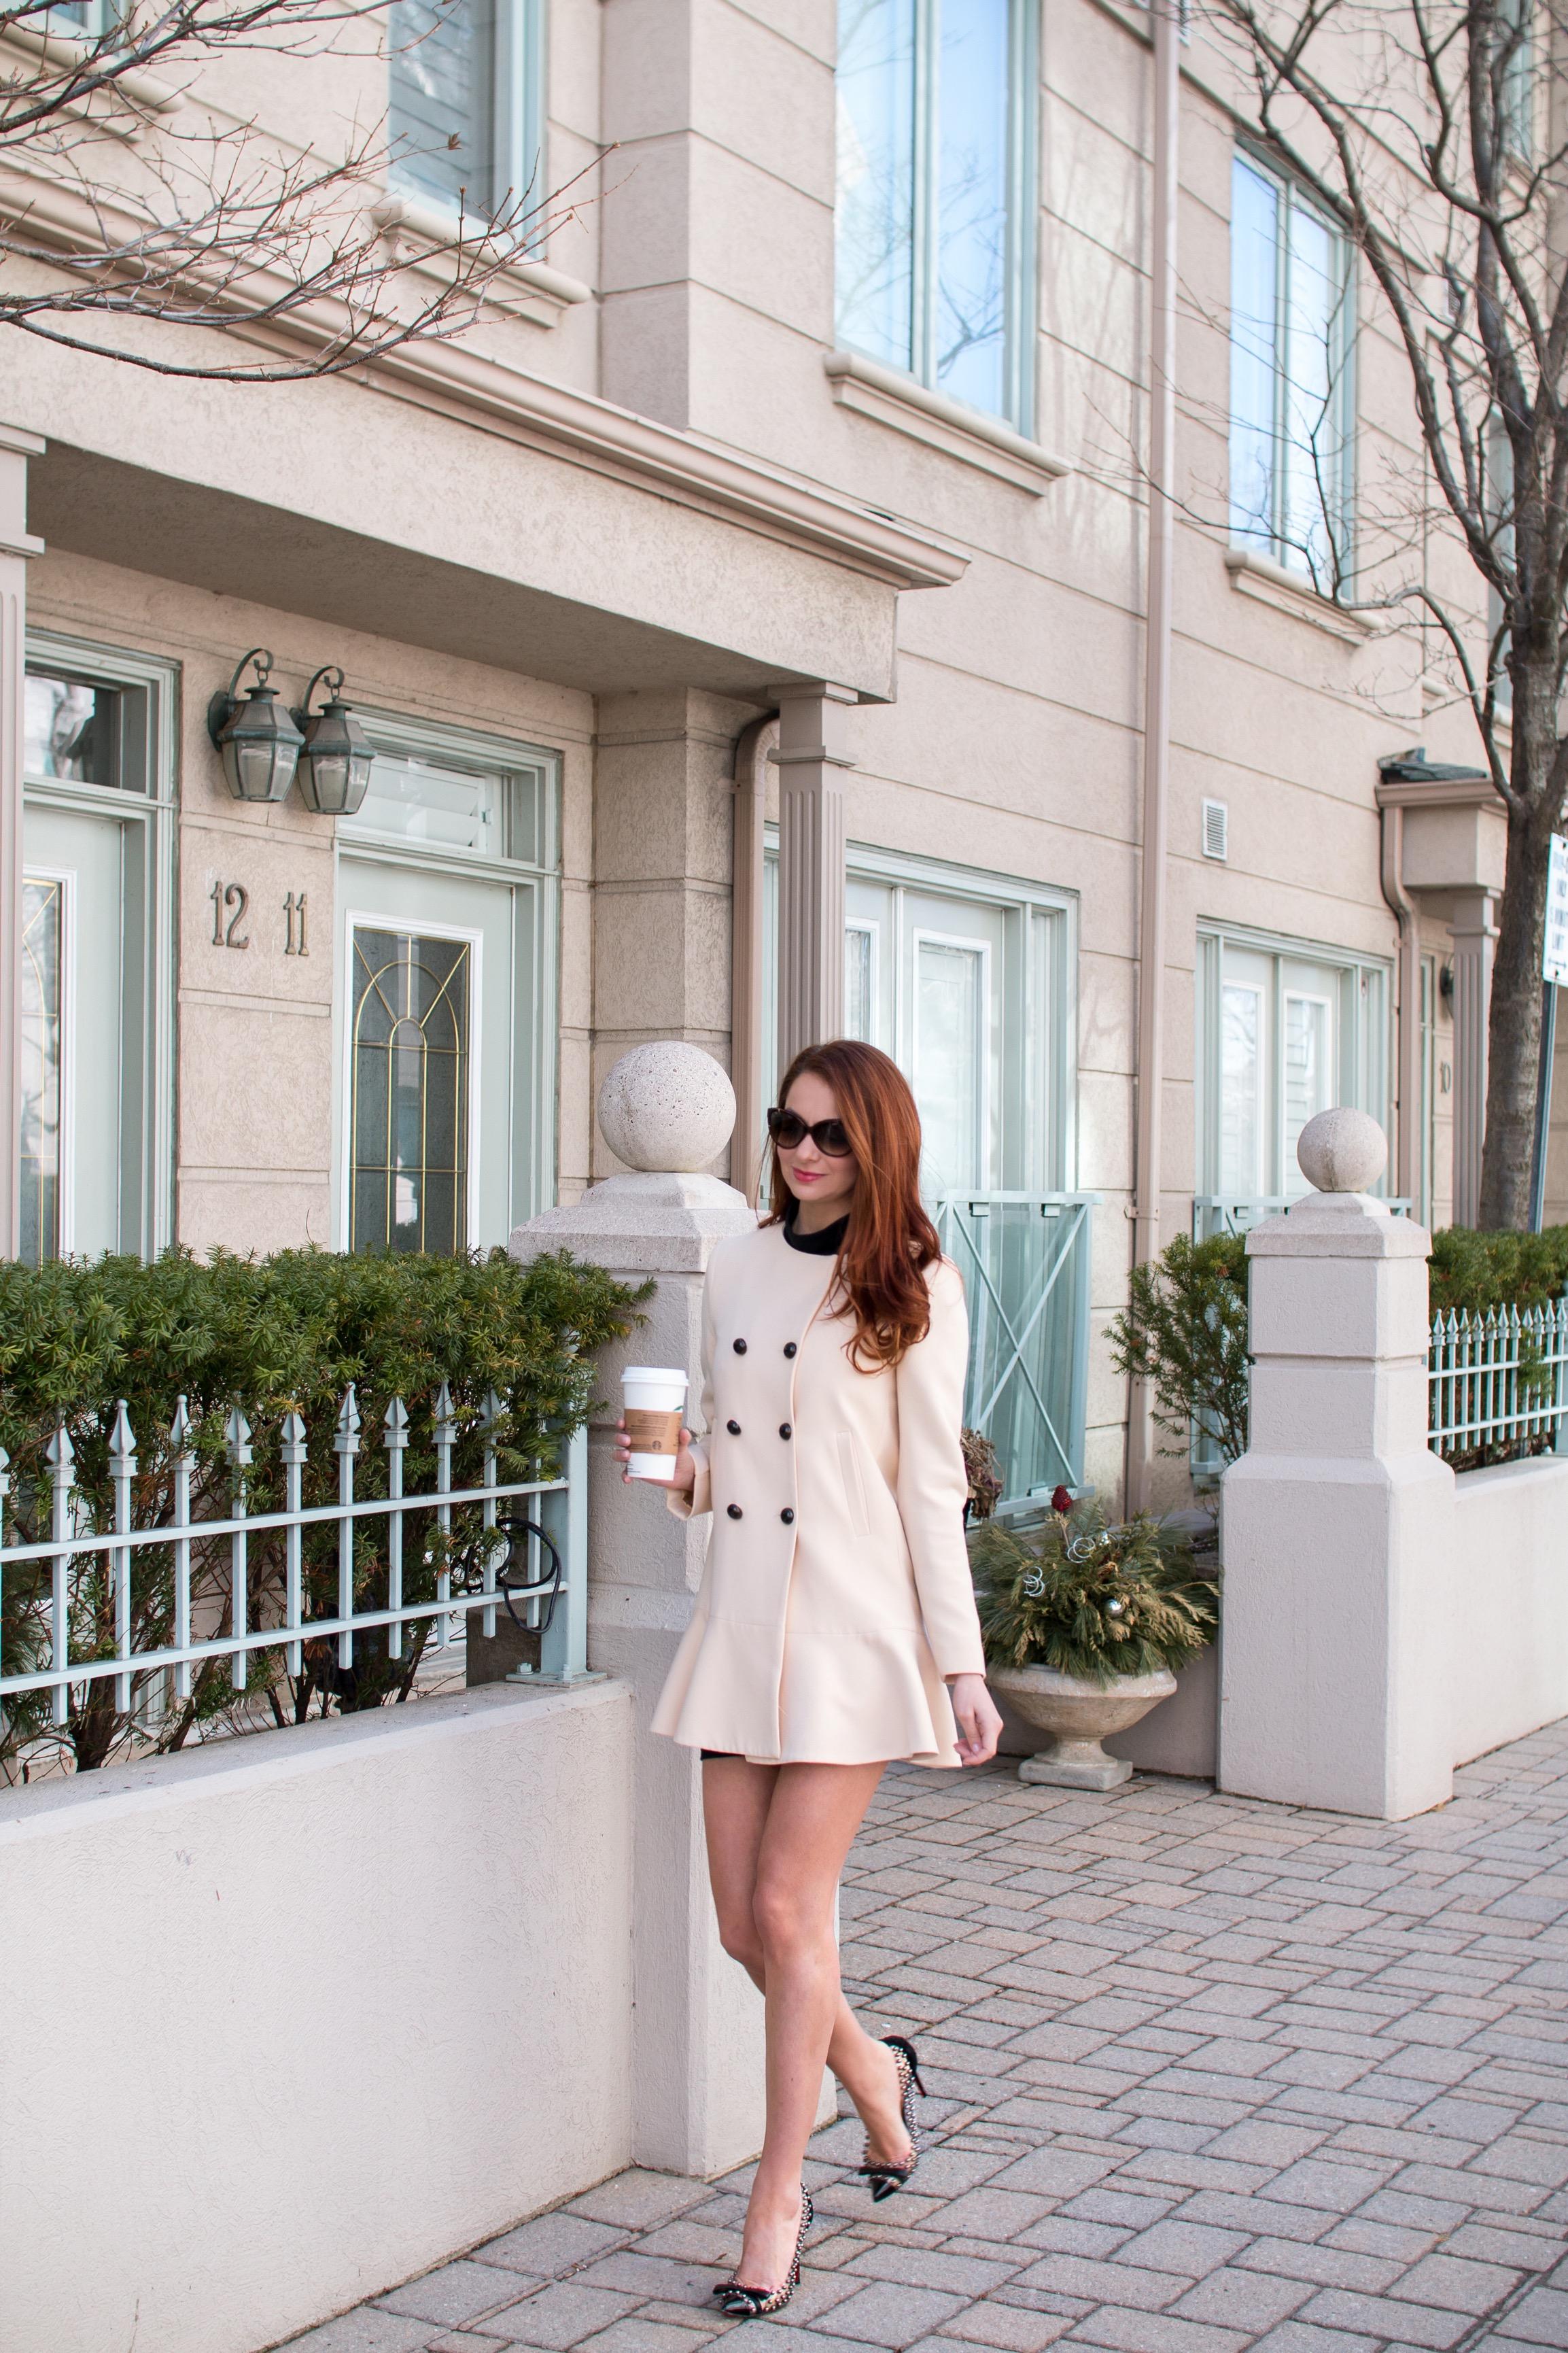 I AM WEARING:    Zara    Coat /    Christian Louboutin    Pumps /    Chloe    Sunglasses